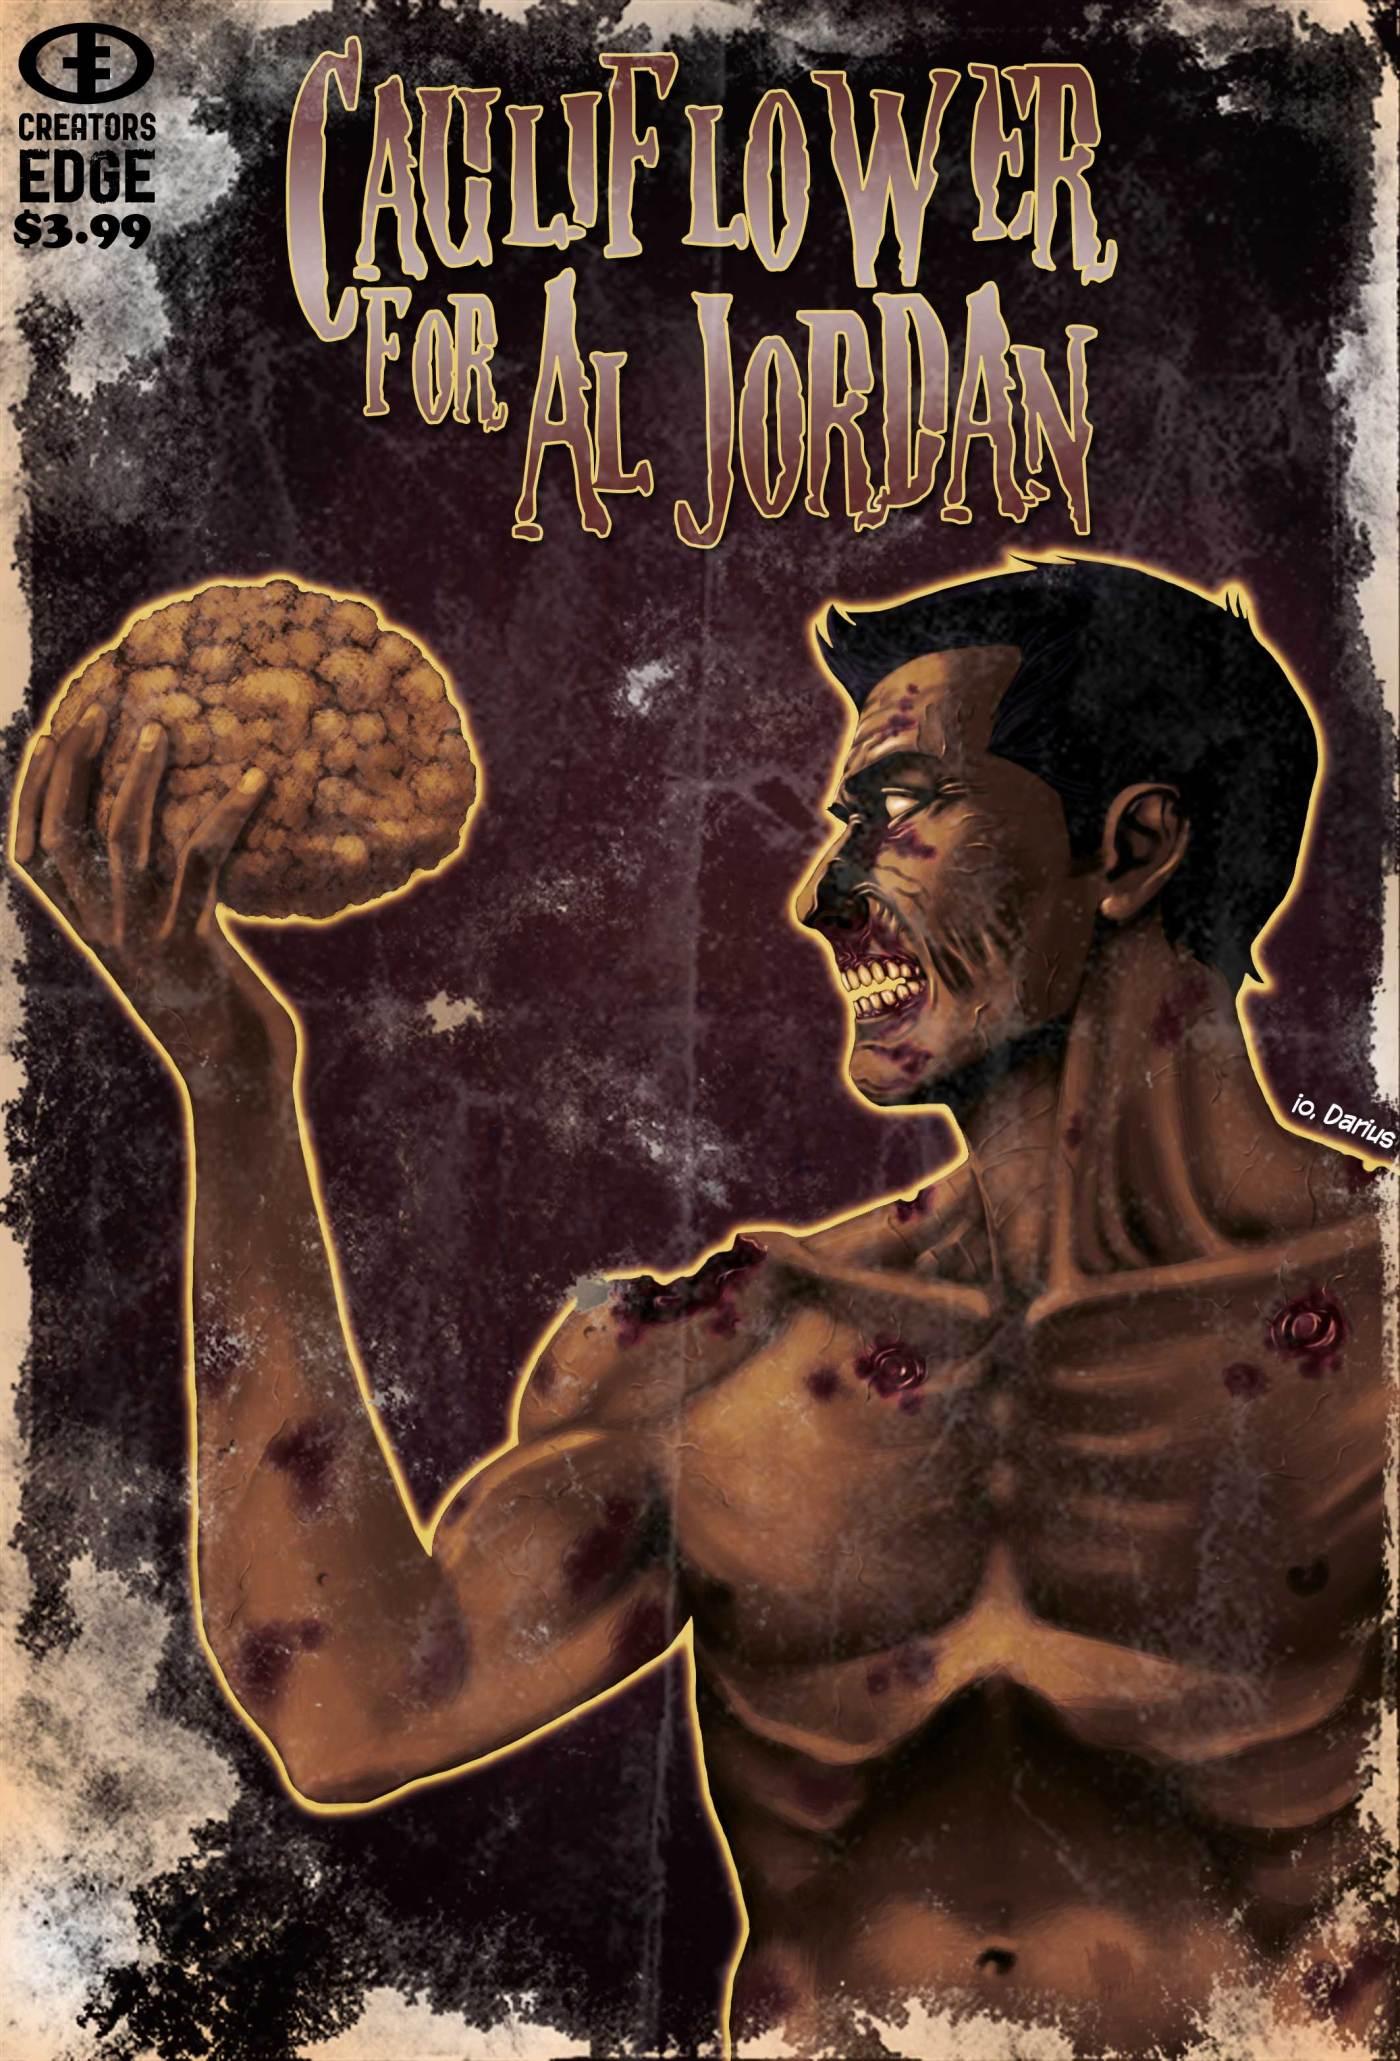 Caulflower for Al Jordan